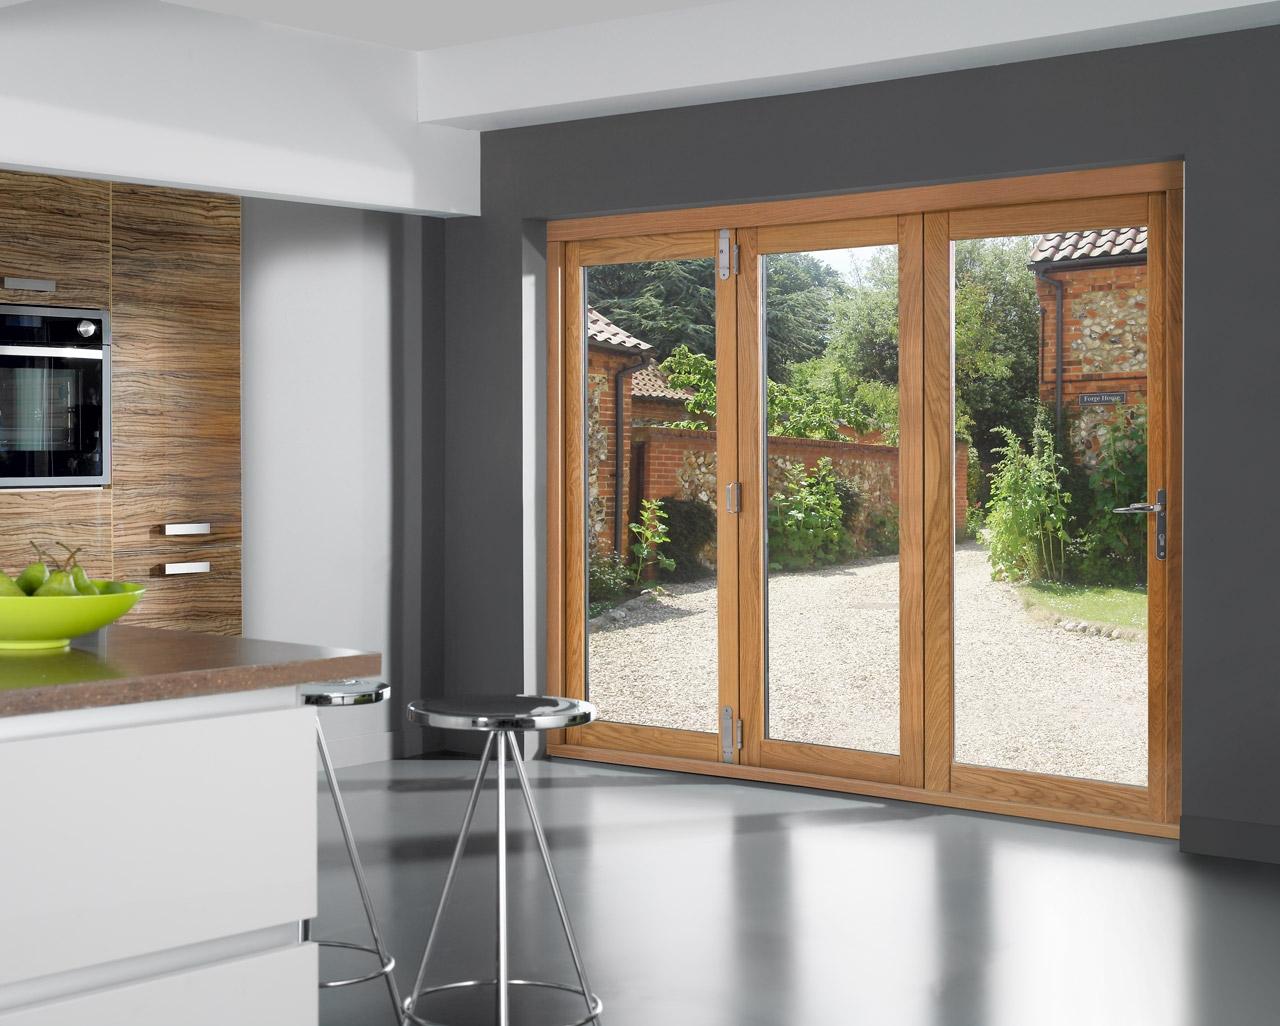 9 Foot Sliding Glass Patio Doors9 foot sliding glass doors saudireiki